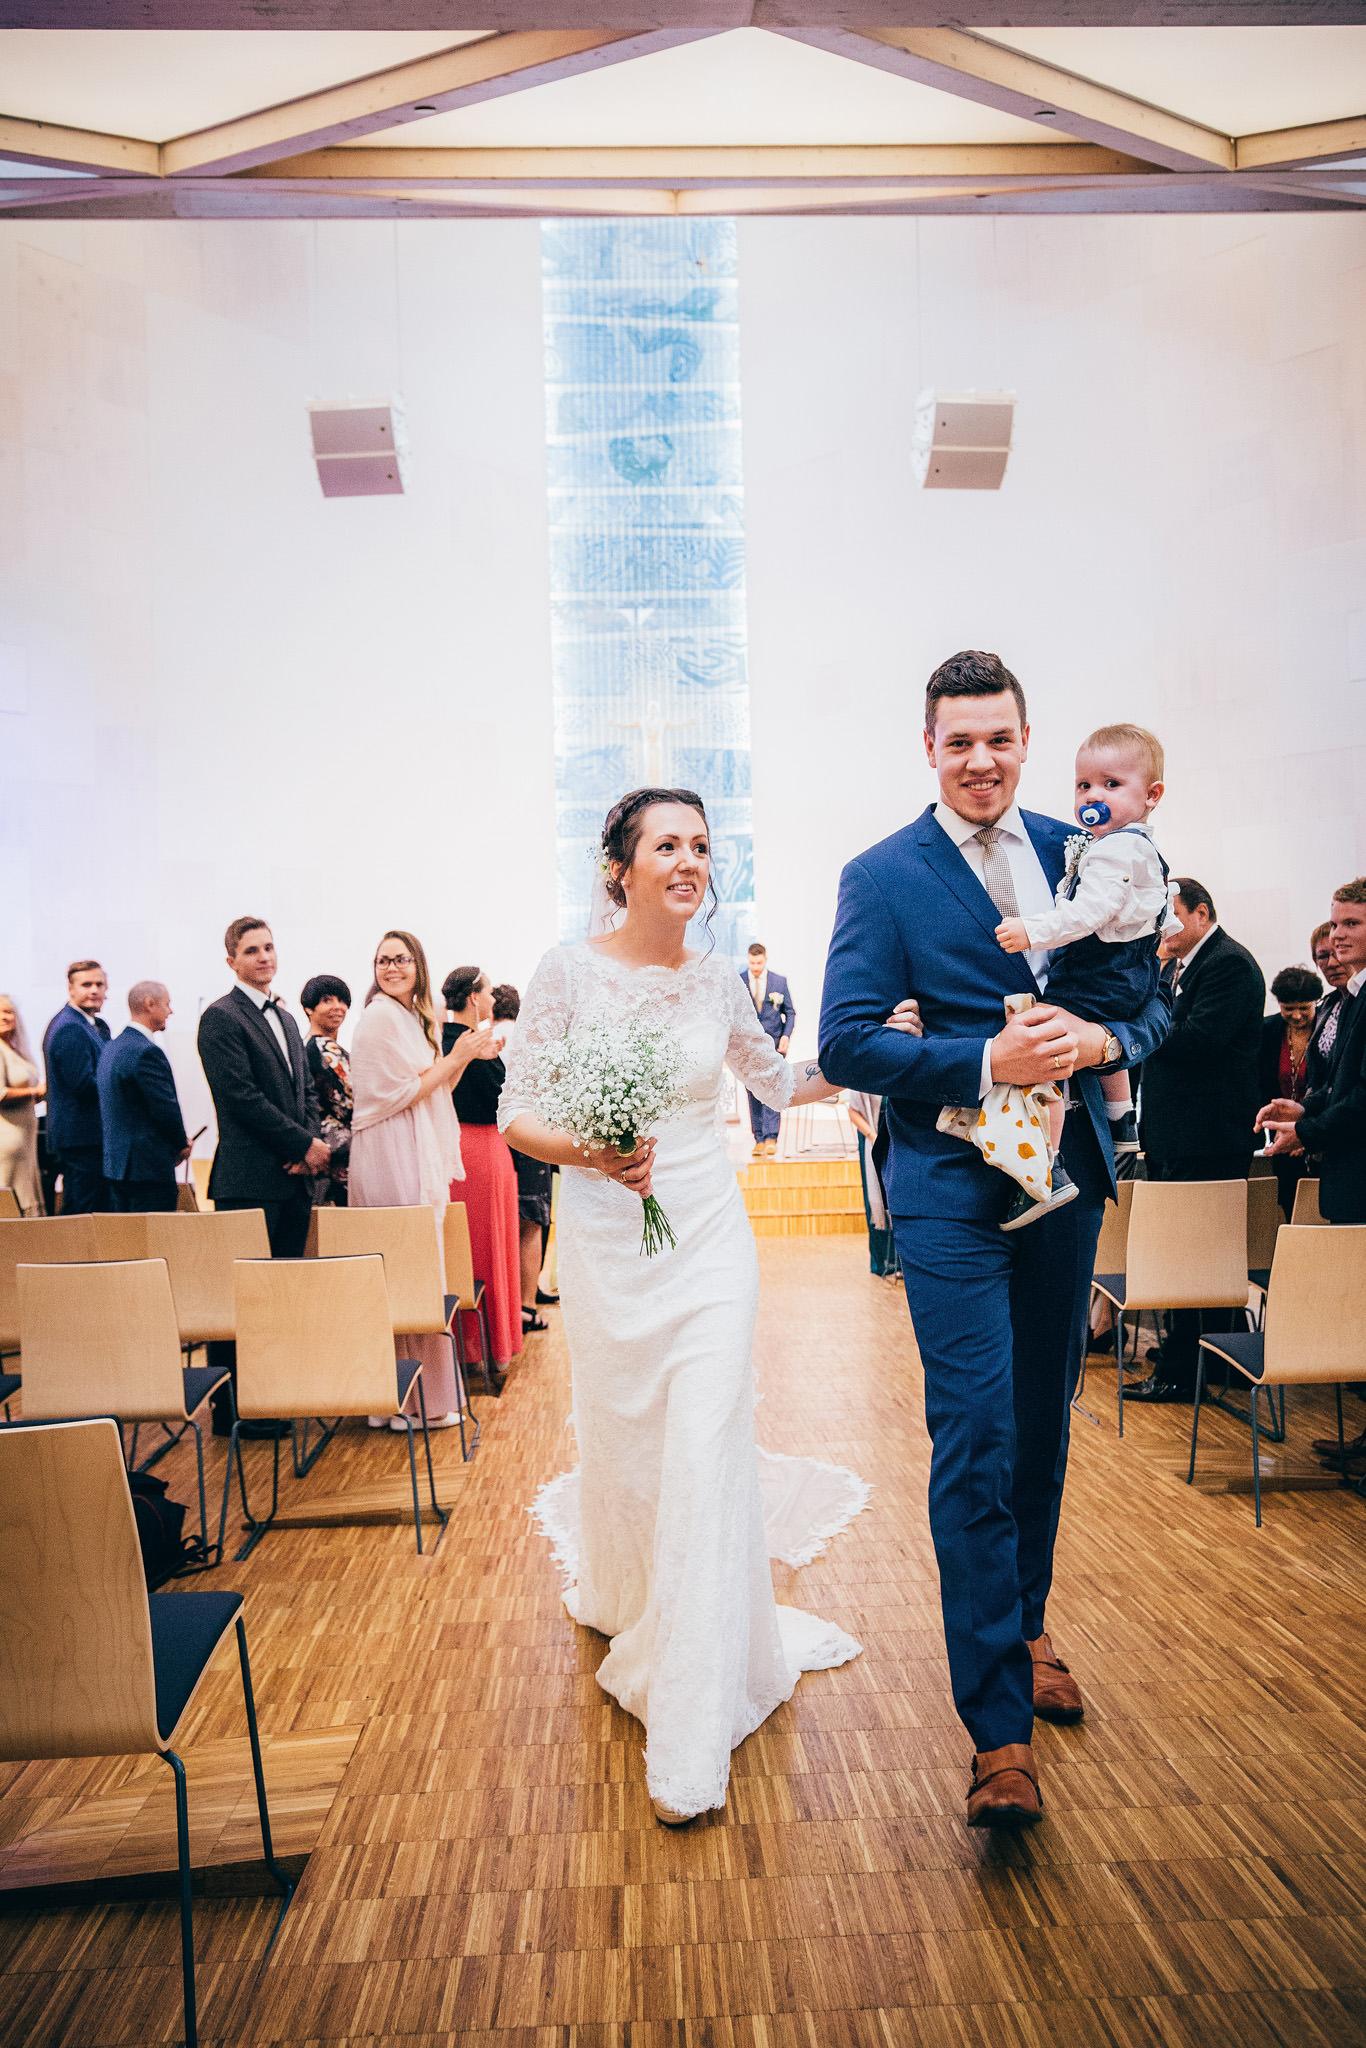 Norway+wedding+photographer+elopement+pre+wedding+Casey+Arneson-45.jpg